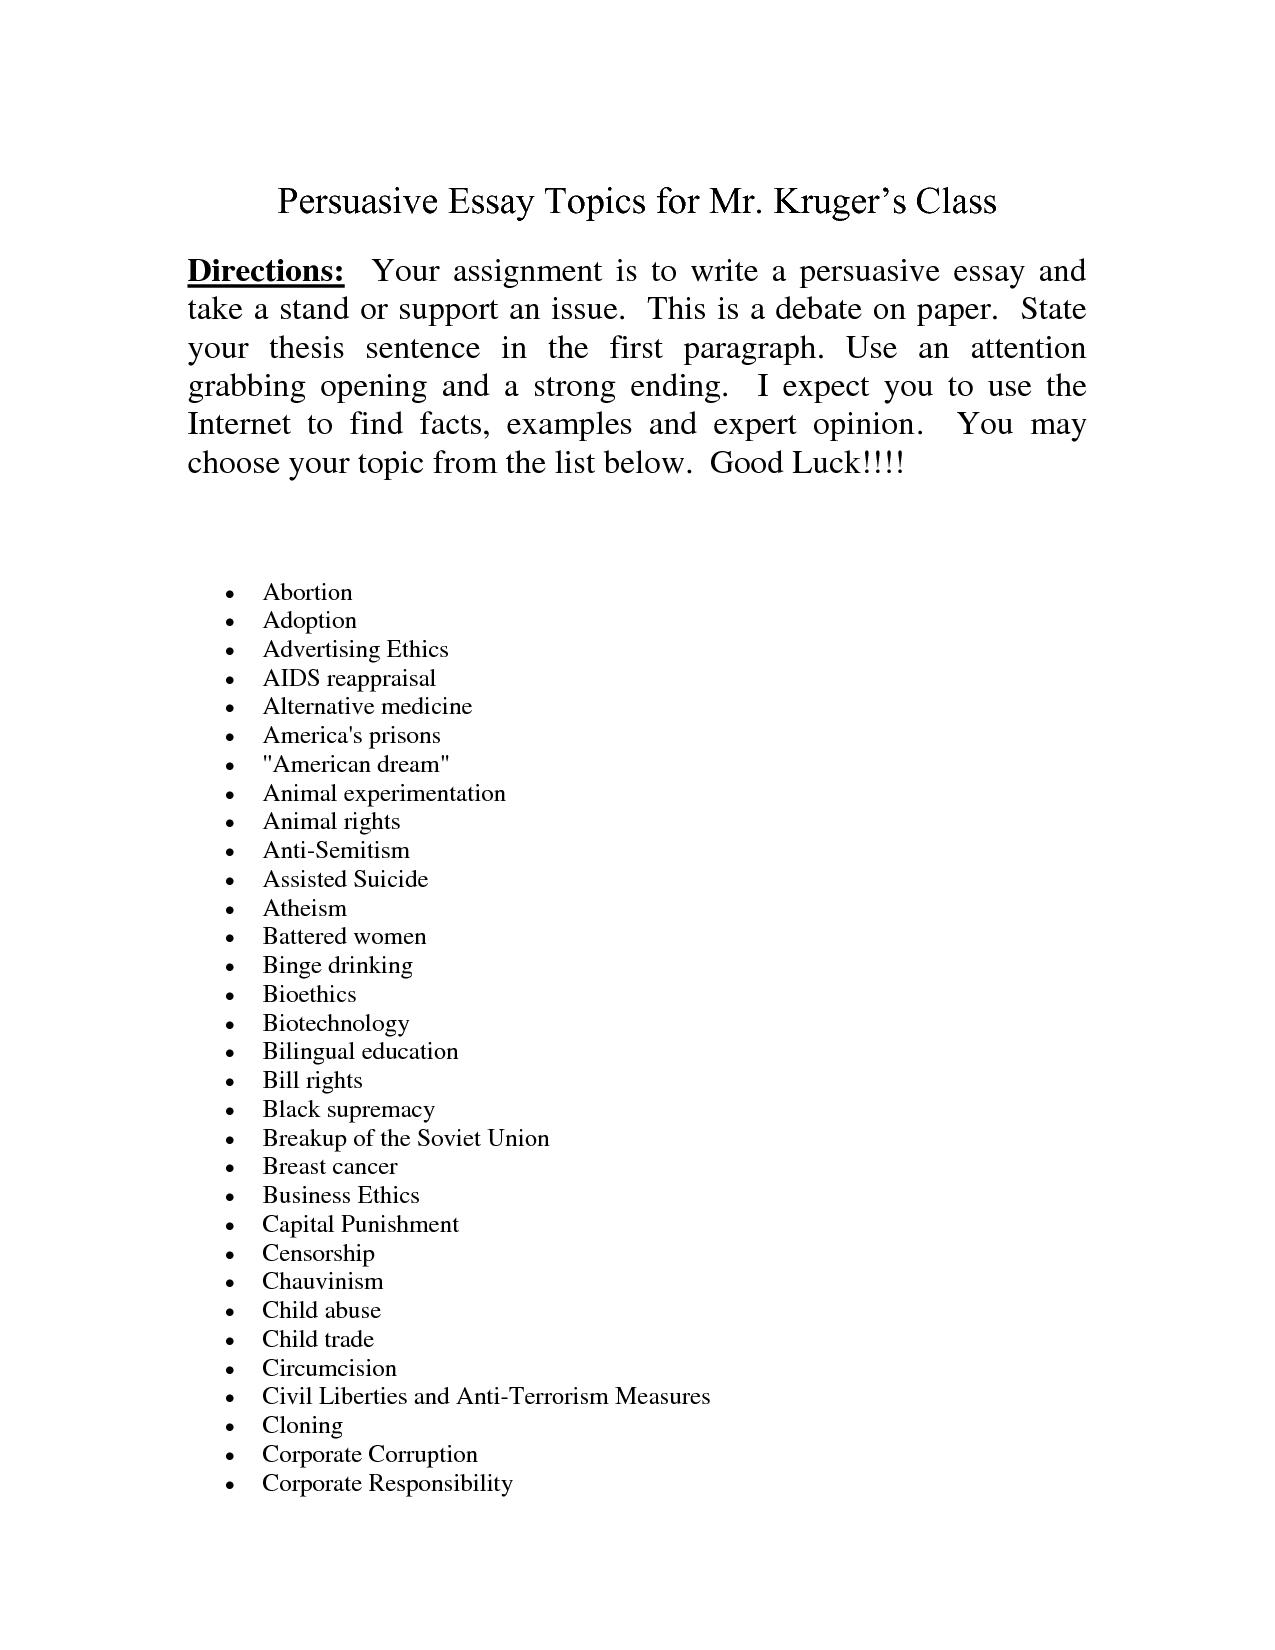 010 Good Persuasive Essay Topics K2g37wzqlu Amazing For College Argumentative High School Full